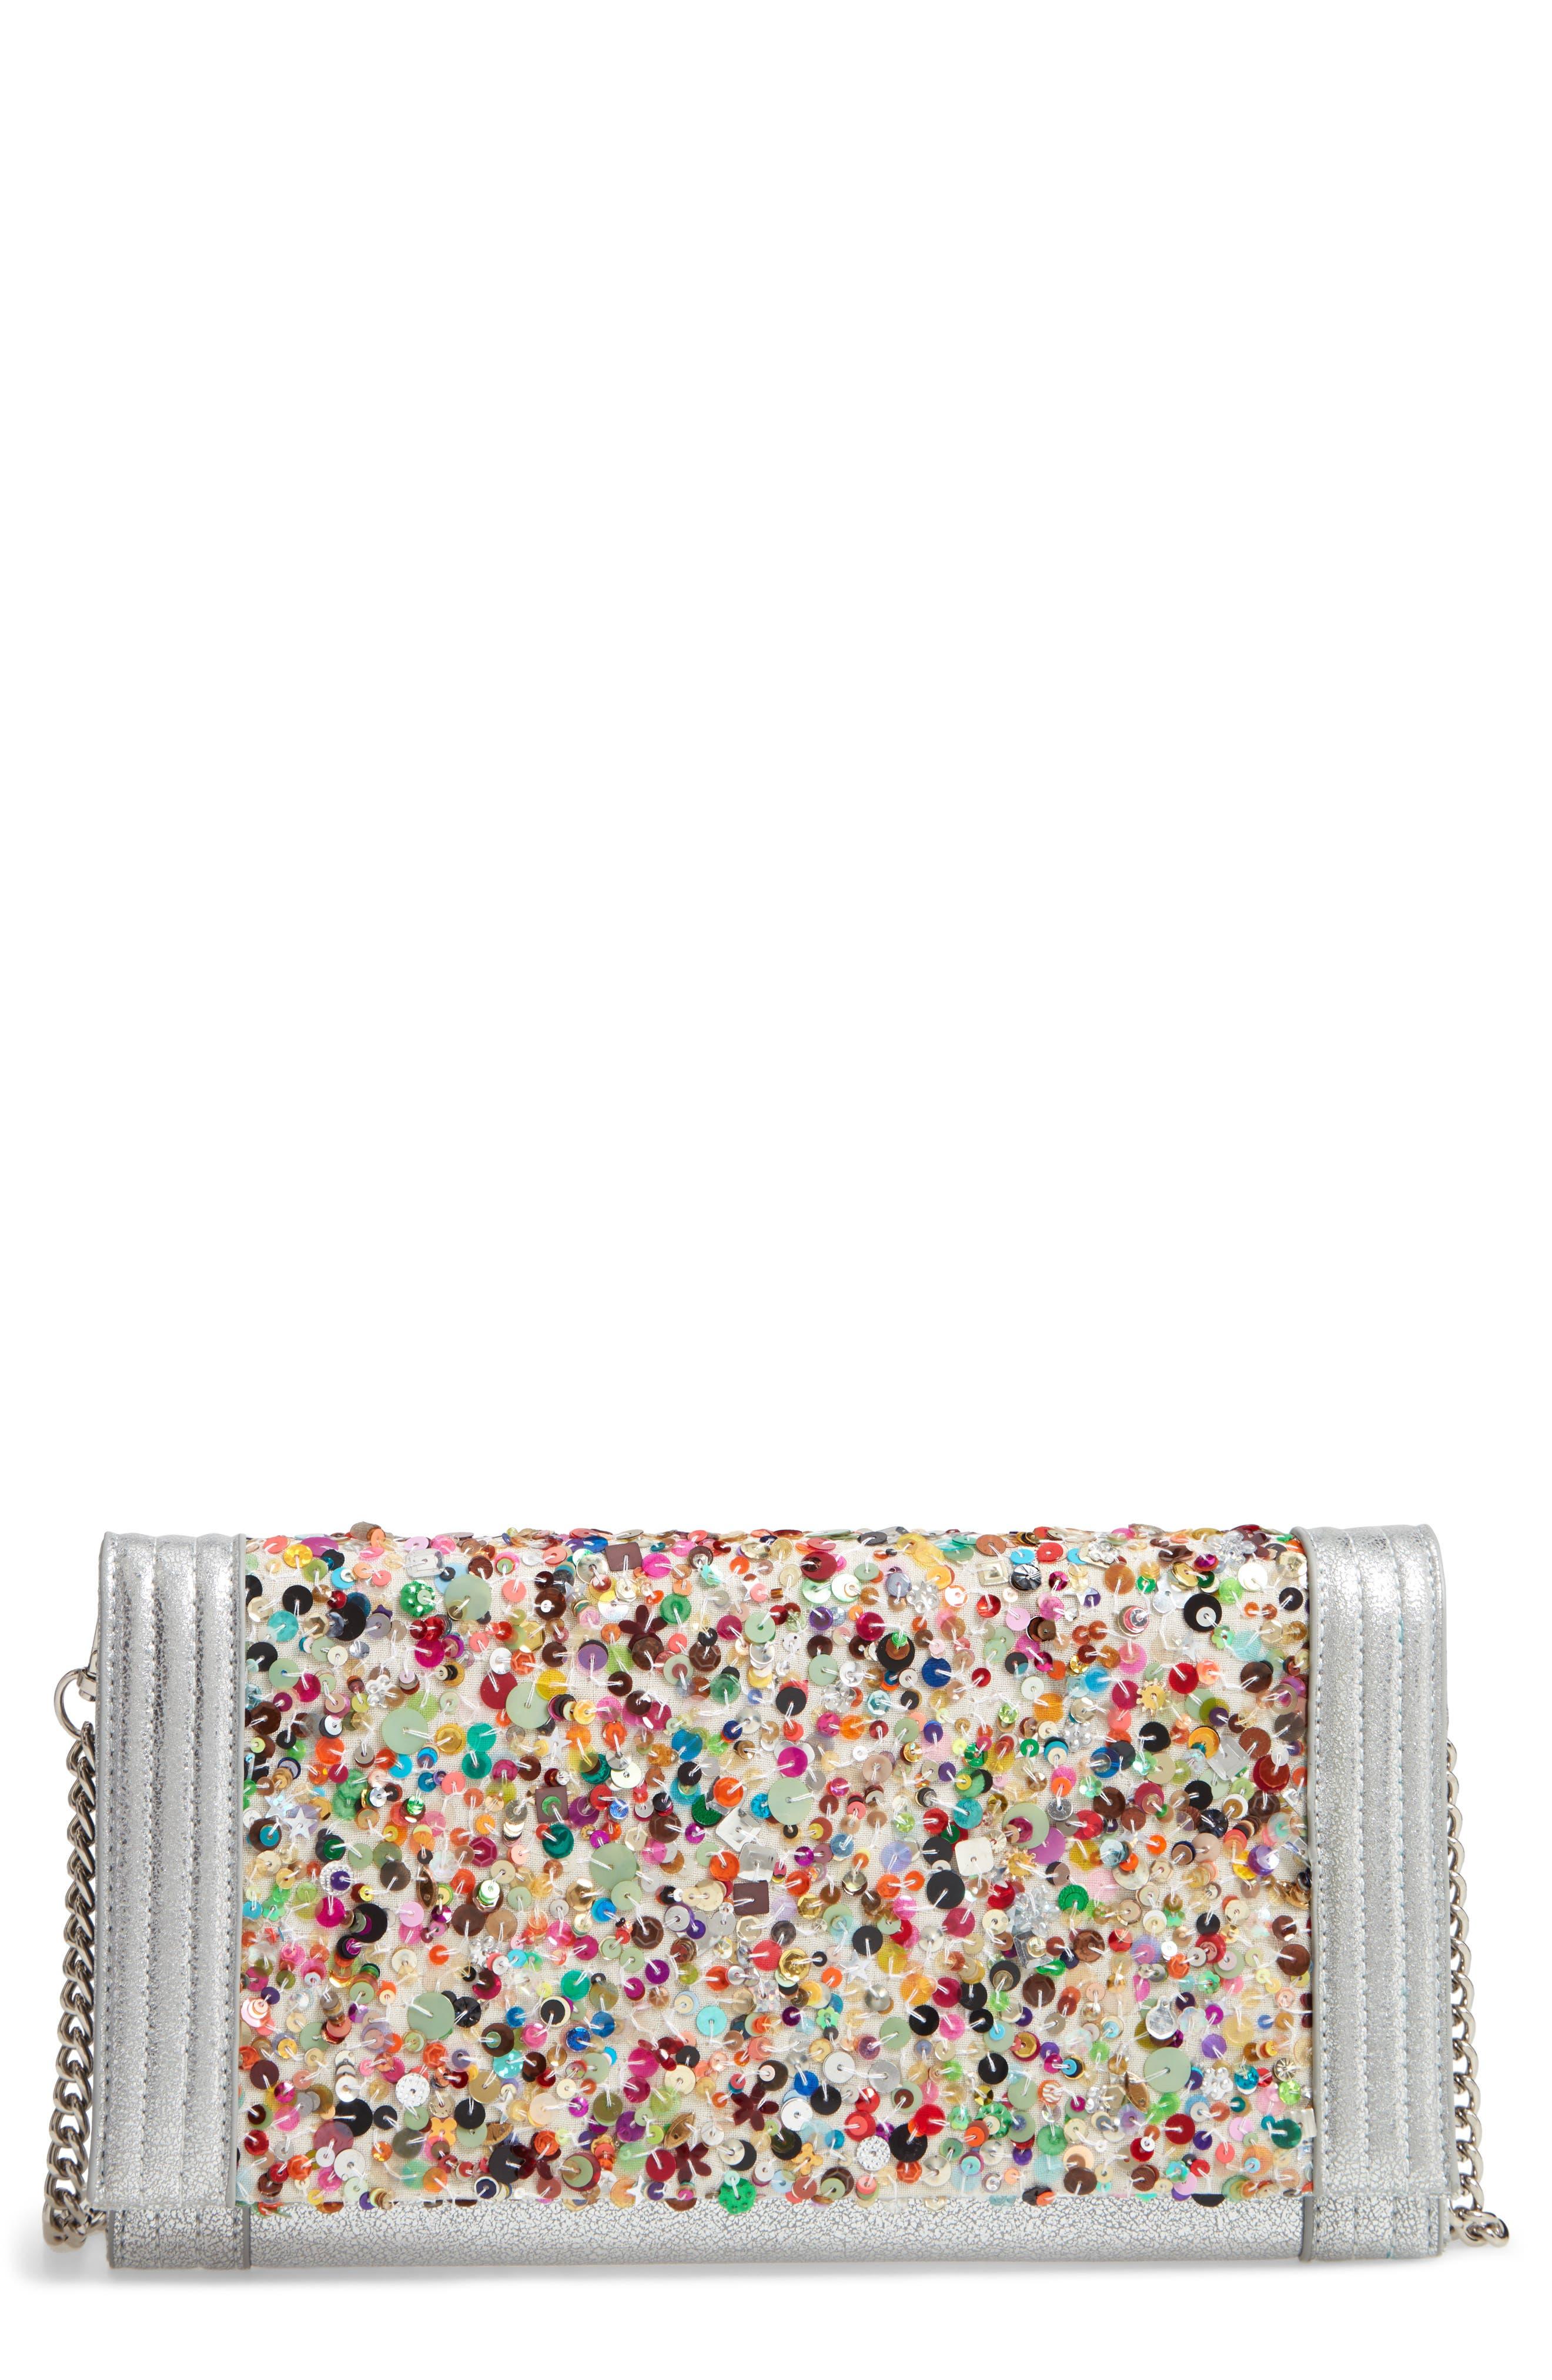 SONDRA ROBERTS Confetti Flap Clutch, Main, color, SILVER